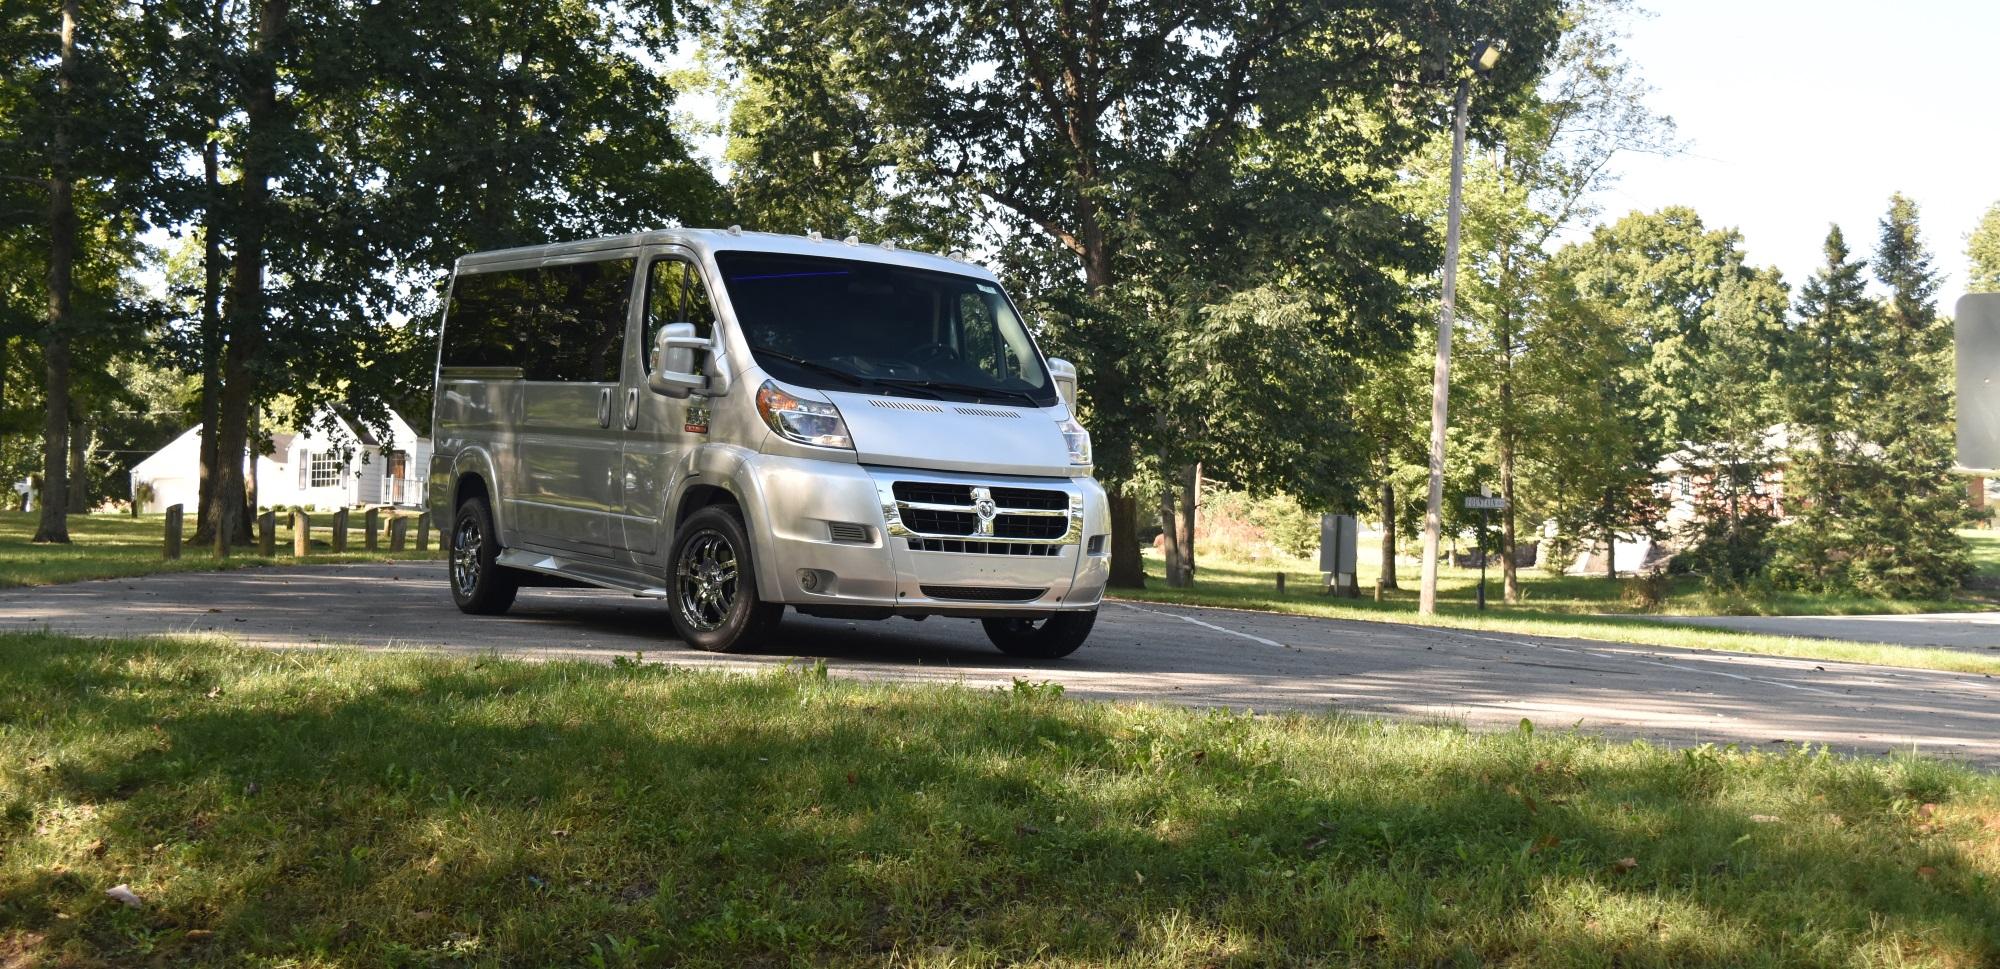 New Ram Promaster Conversion Vans